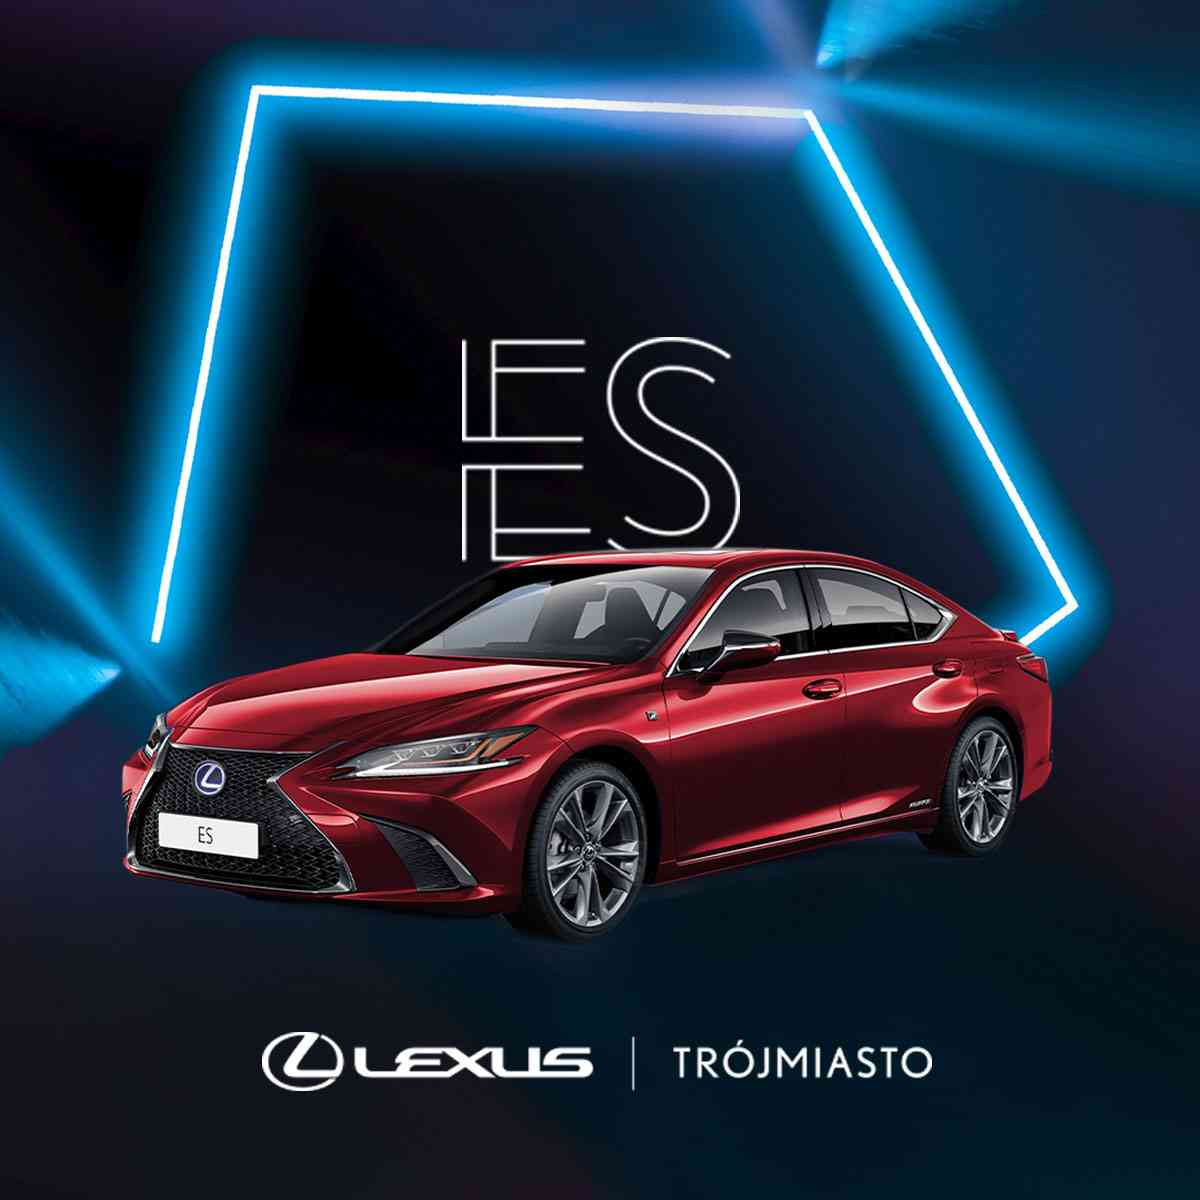 Lexus-ES_www-04-2021